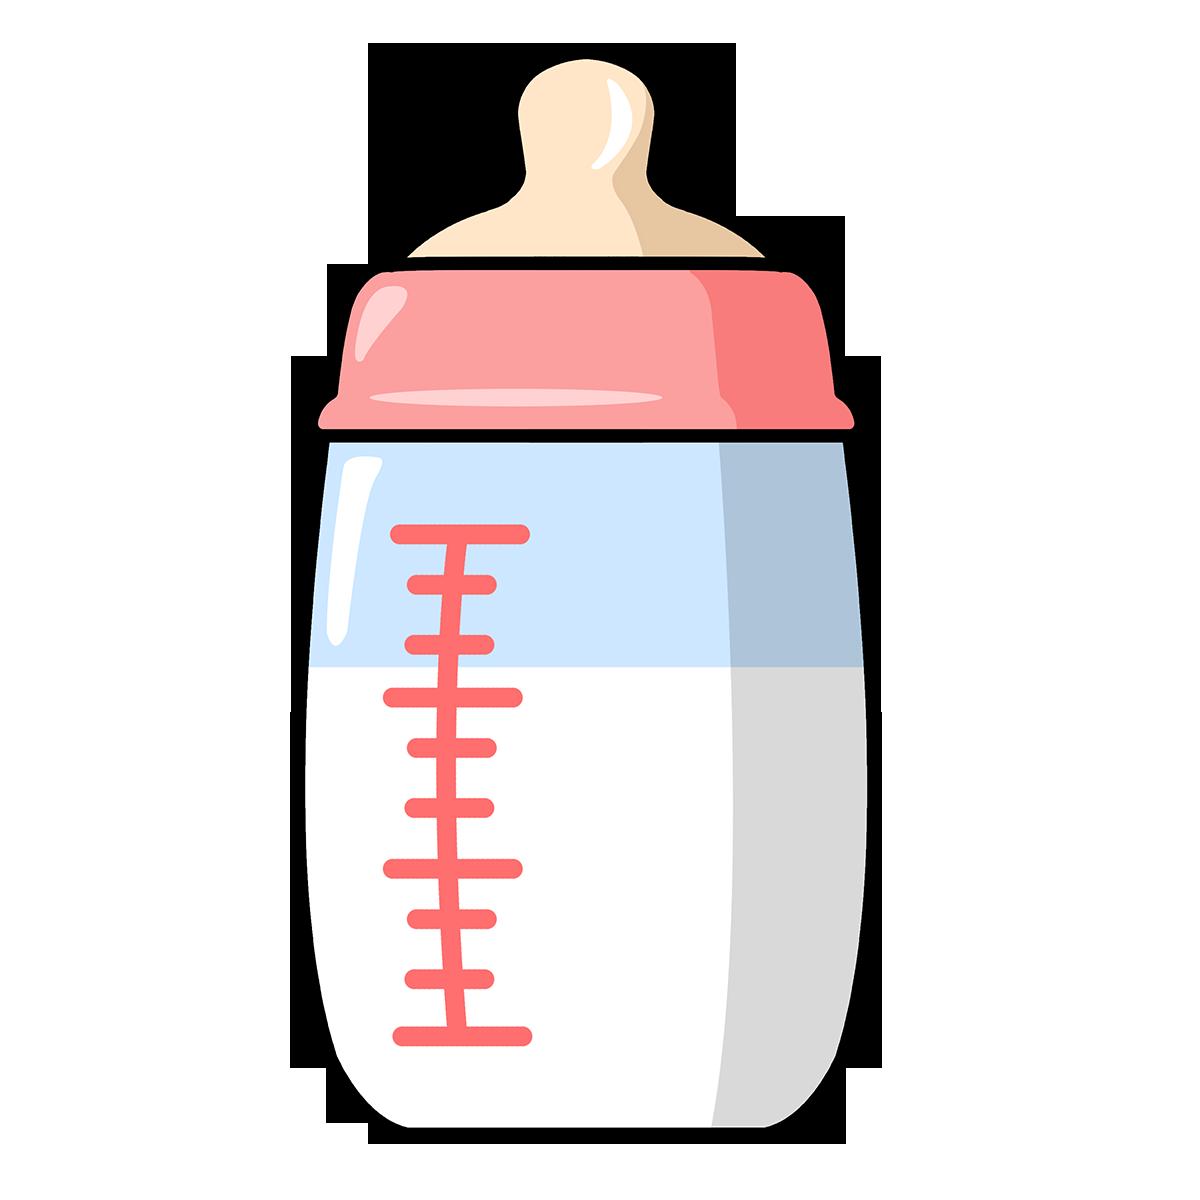 Baseball baby swoosh clipart clip art free stock Free to use & public domain baby bottle clip art #babystuff http ... clip art free stock